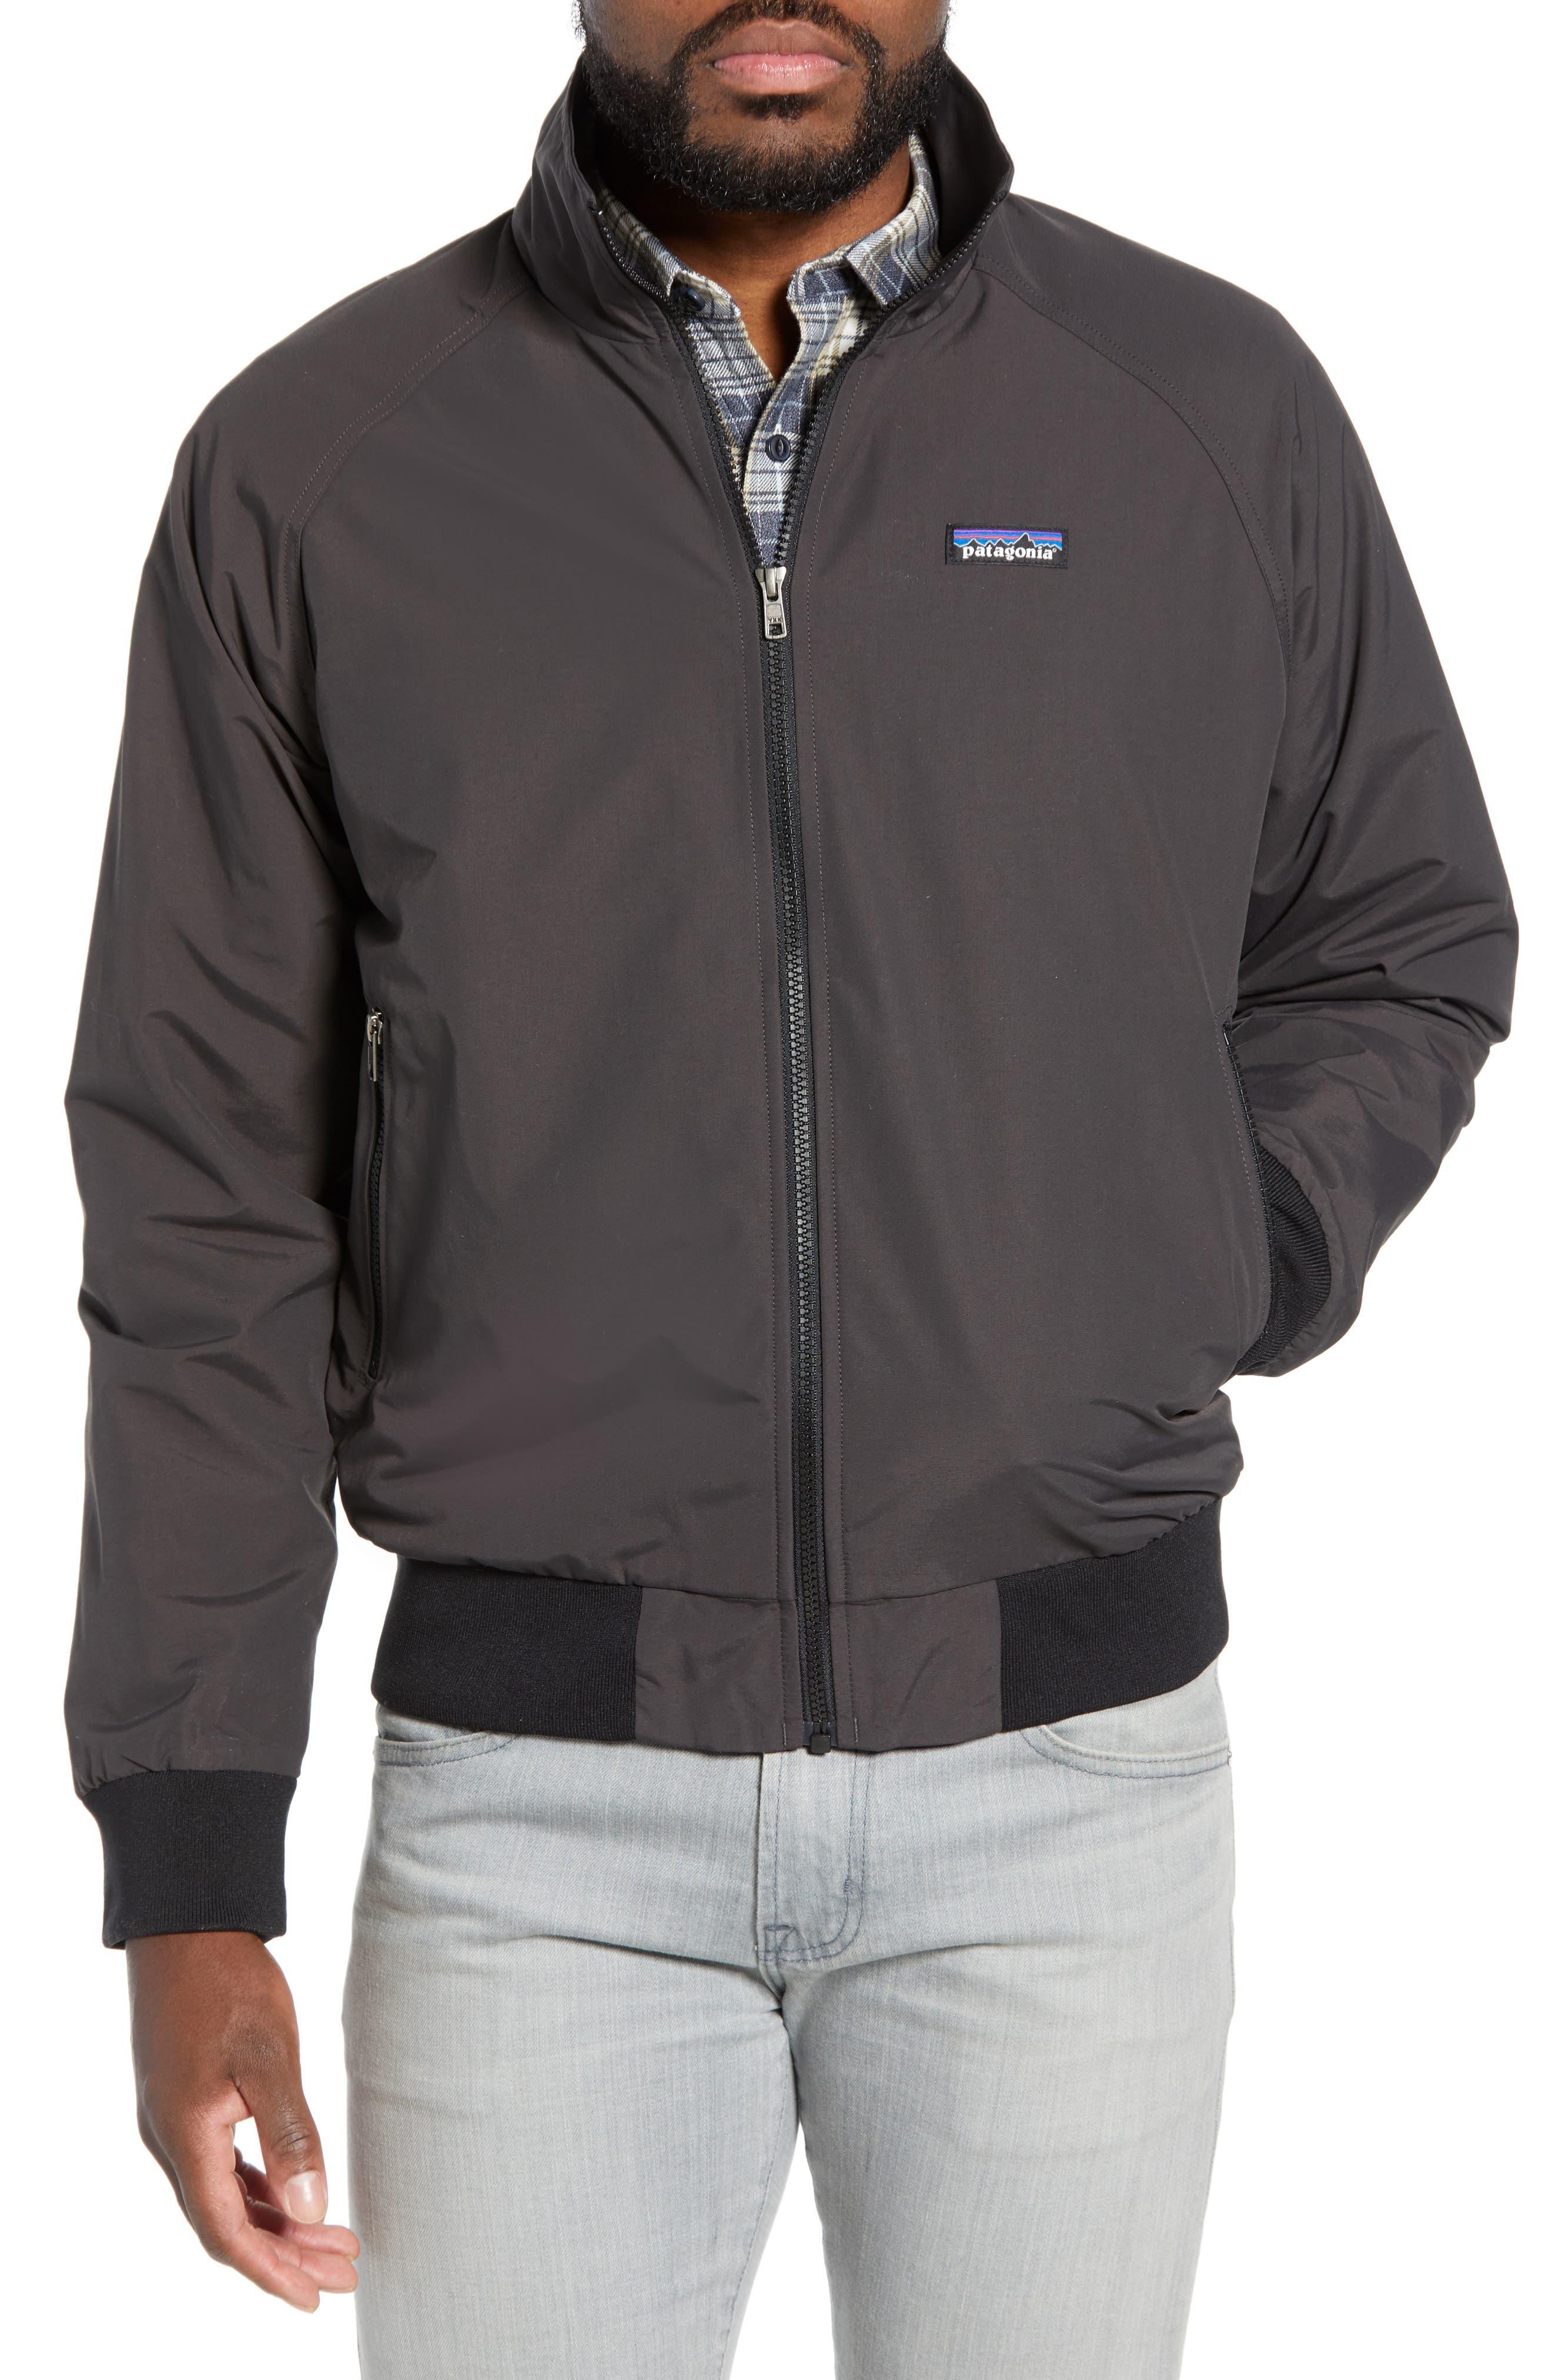 PATAGONIA, Baggies Wind & Water Resistant Jacket, Main thumbnail 1, color, INK BLACK